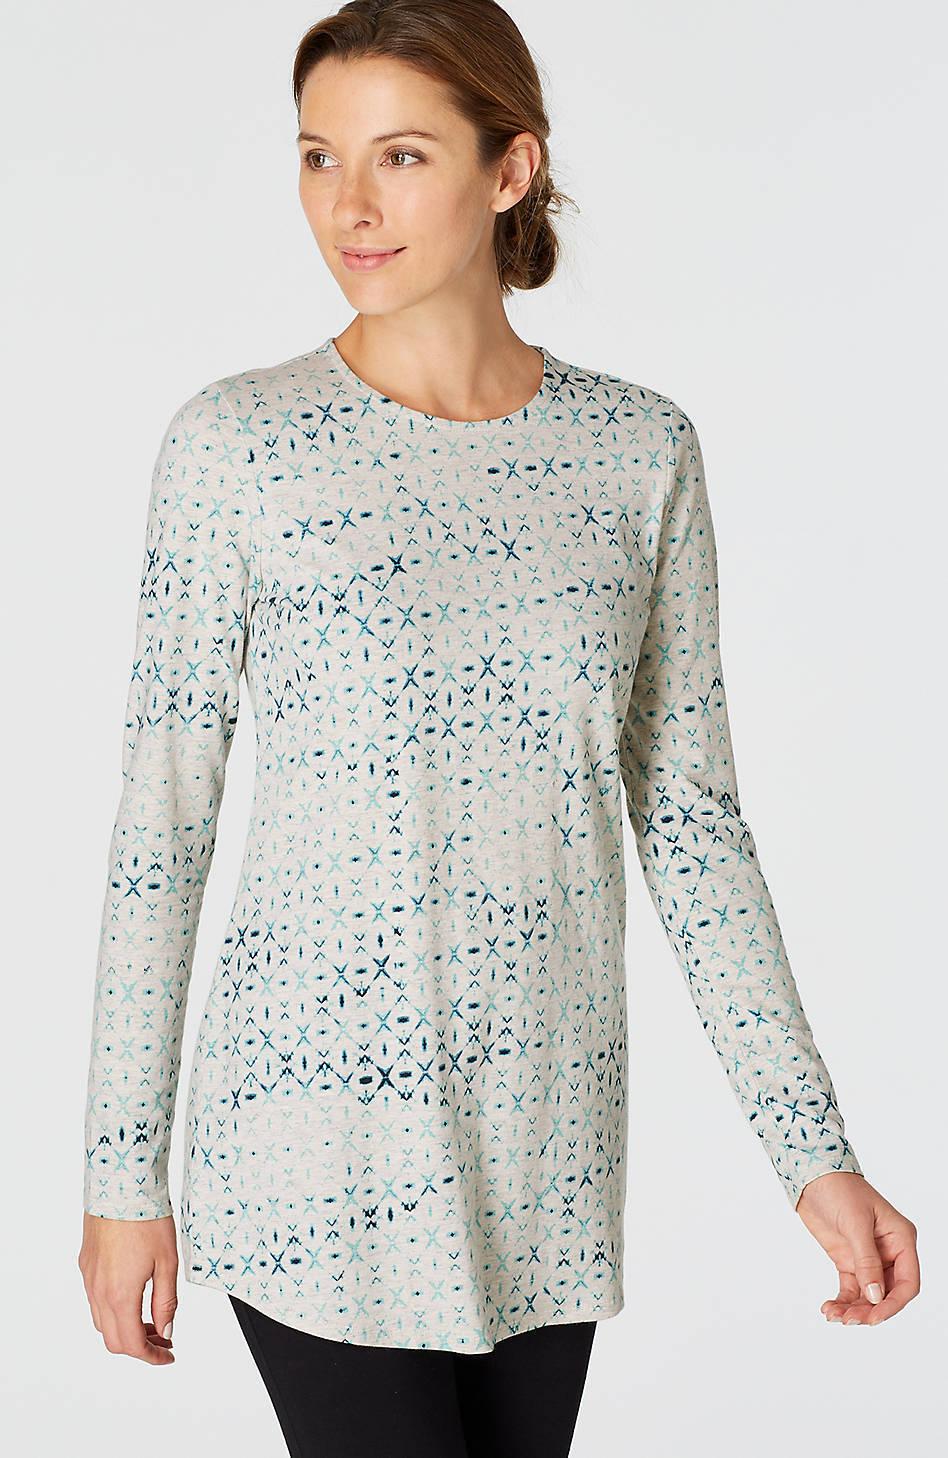 J. Jill - XL - Pure Jill Light grau Heather Diamond Tie Dye Shirttail Tee